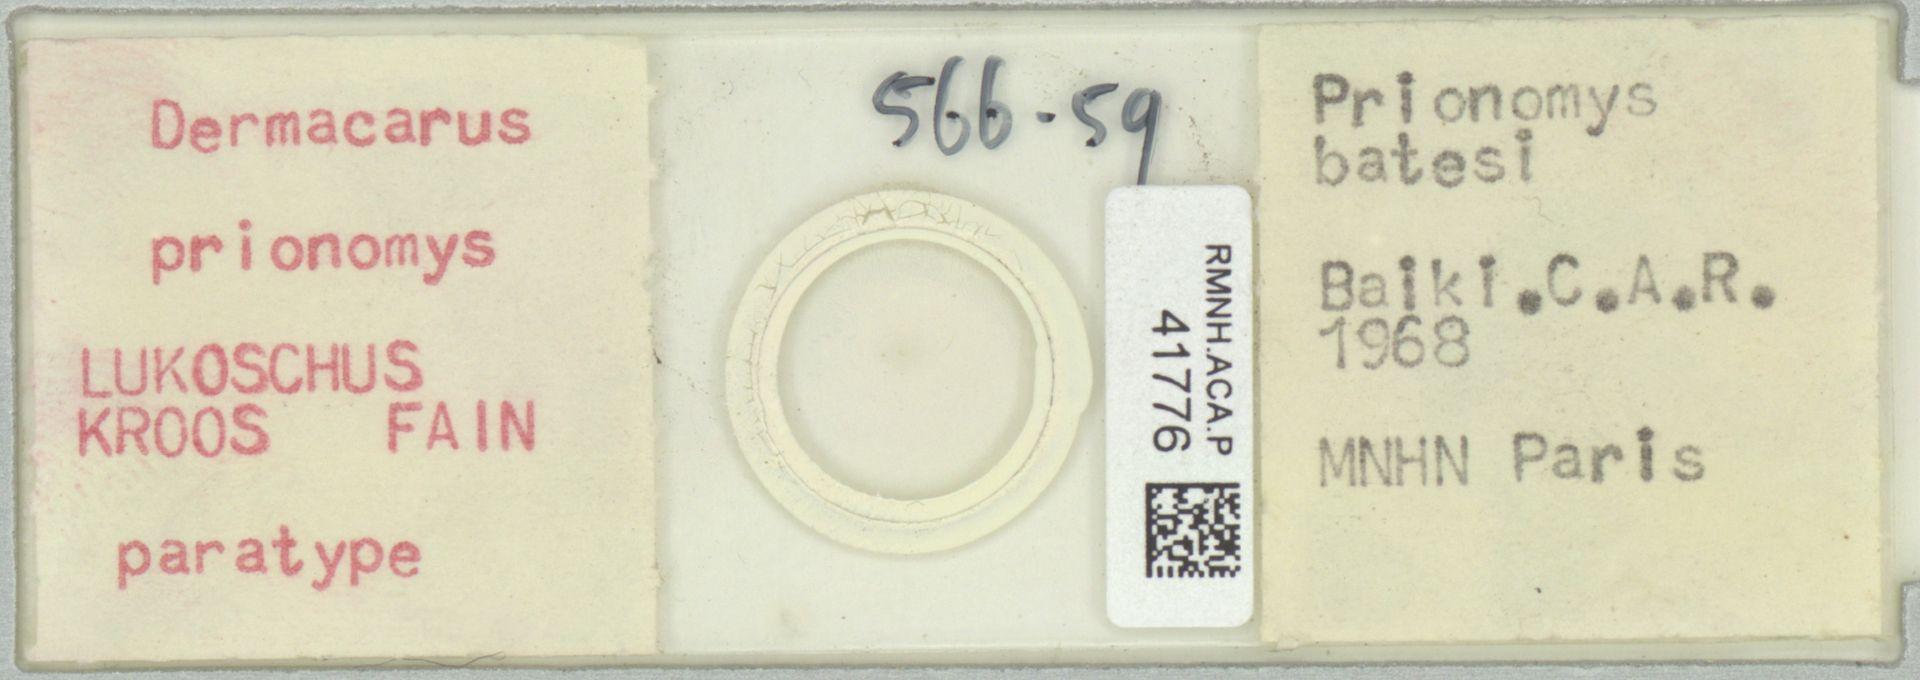 RMNH.ACA.P.41776 | Dermacarus prionomys Lukoschus, Kroos & Fain